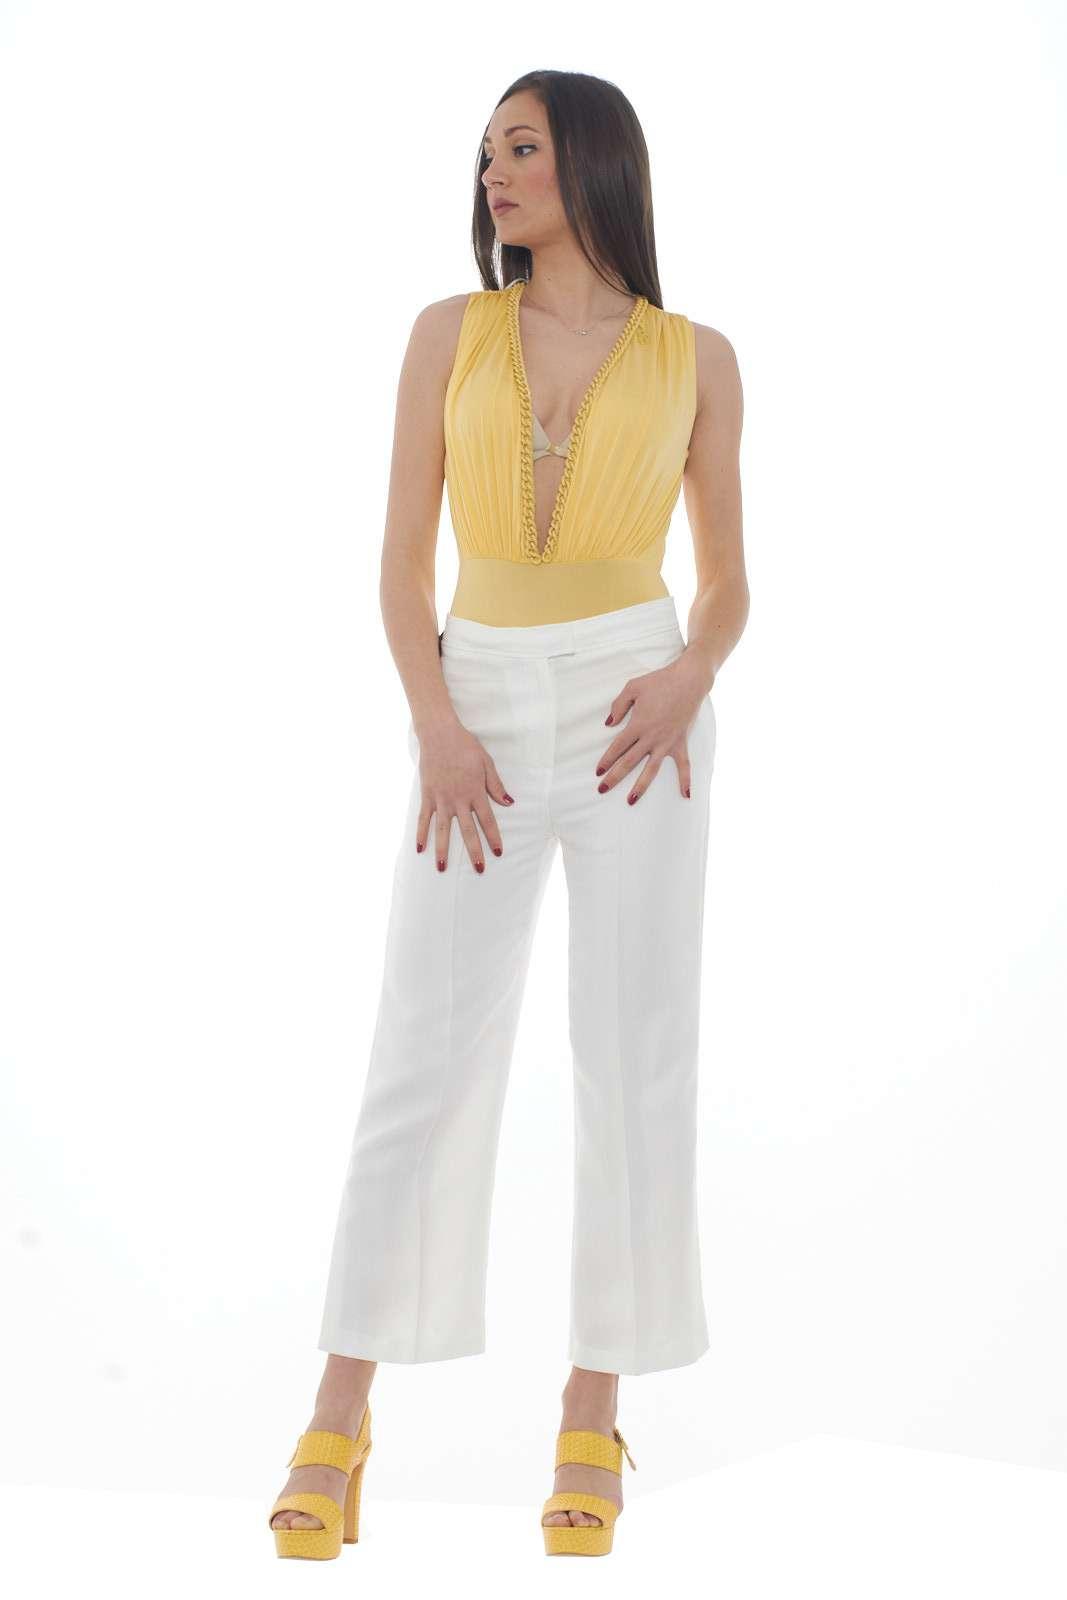 https://www.parmax.com/media/catalog/product/a/i/PE-outlet_parmax-body-donna-Elisabetta-Franchi-bo16692e2-D.jpg